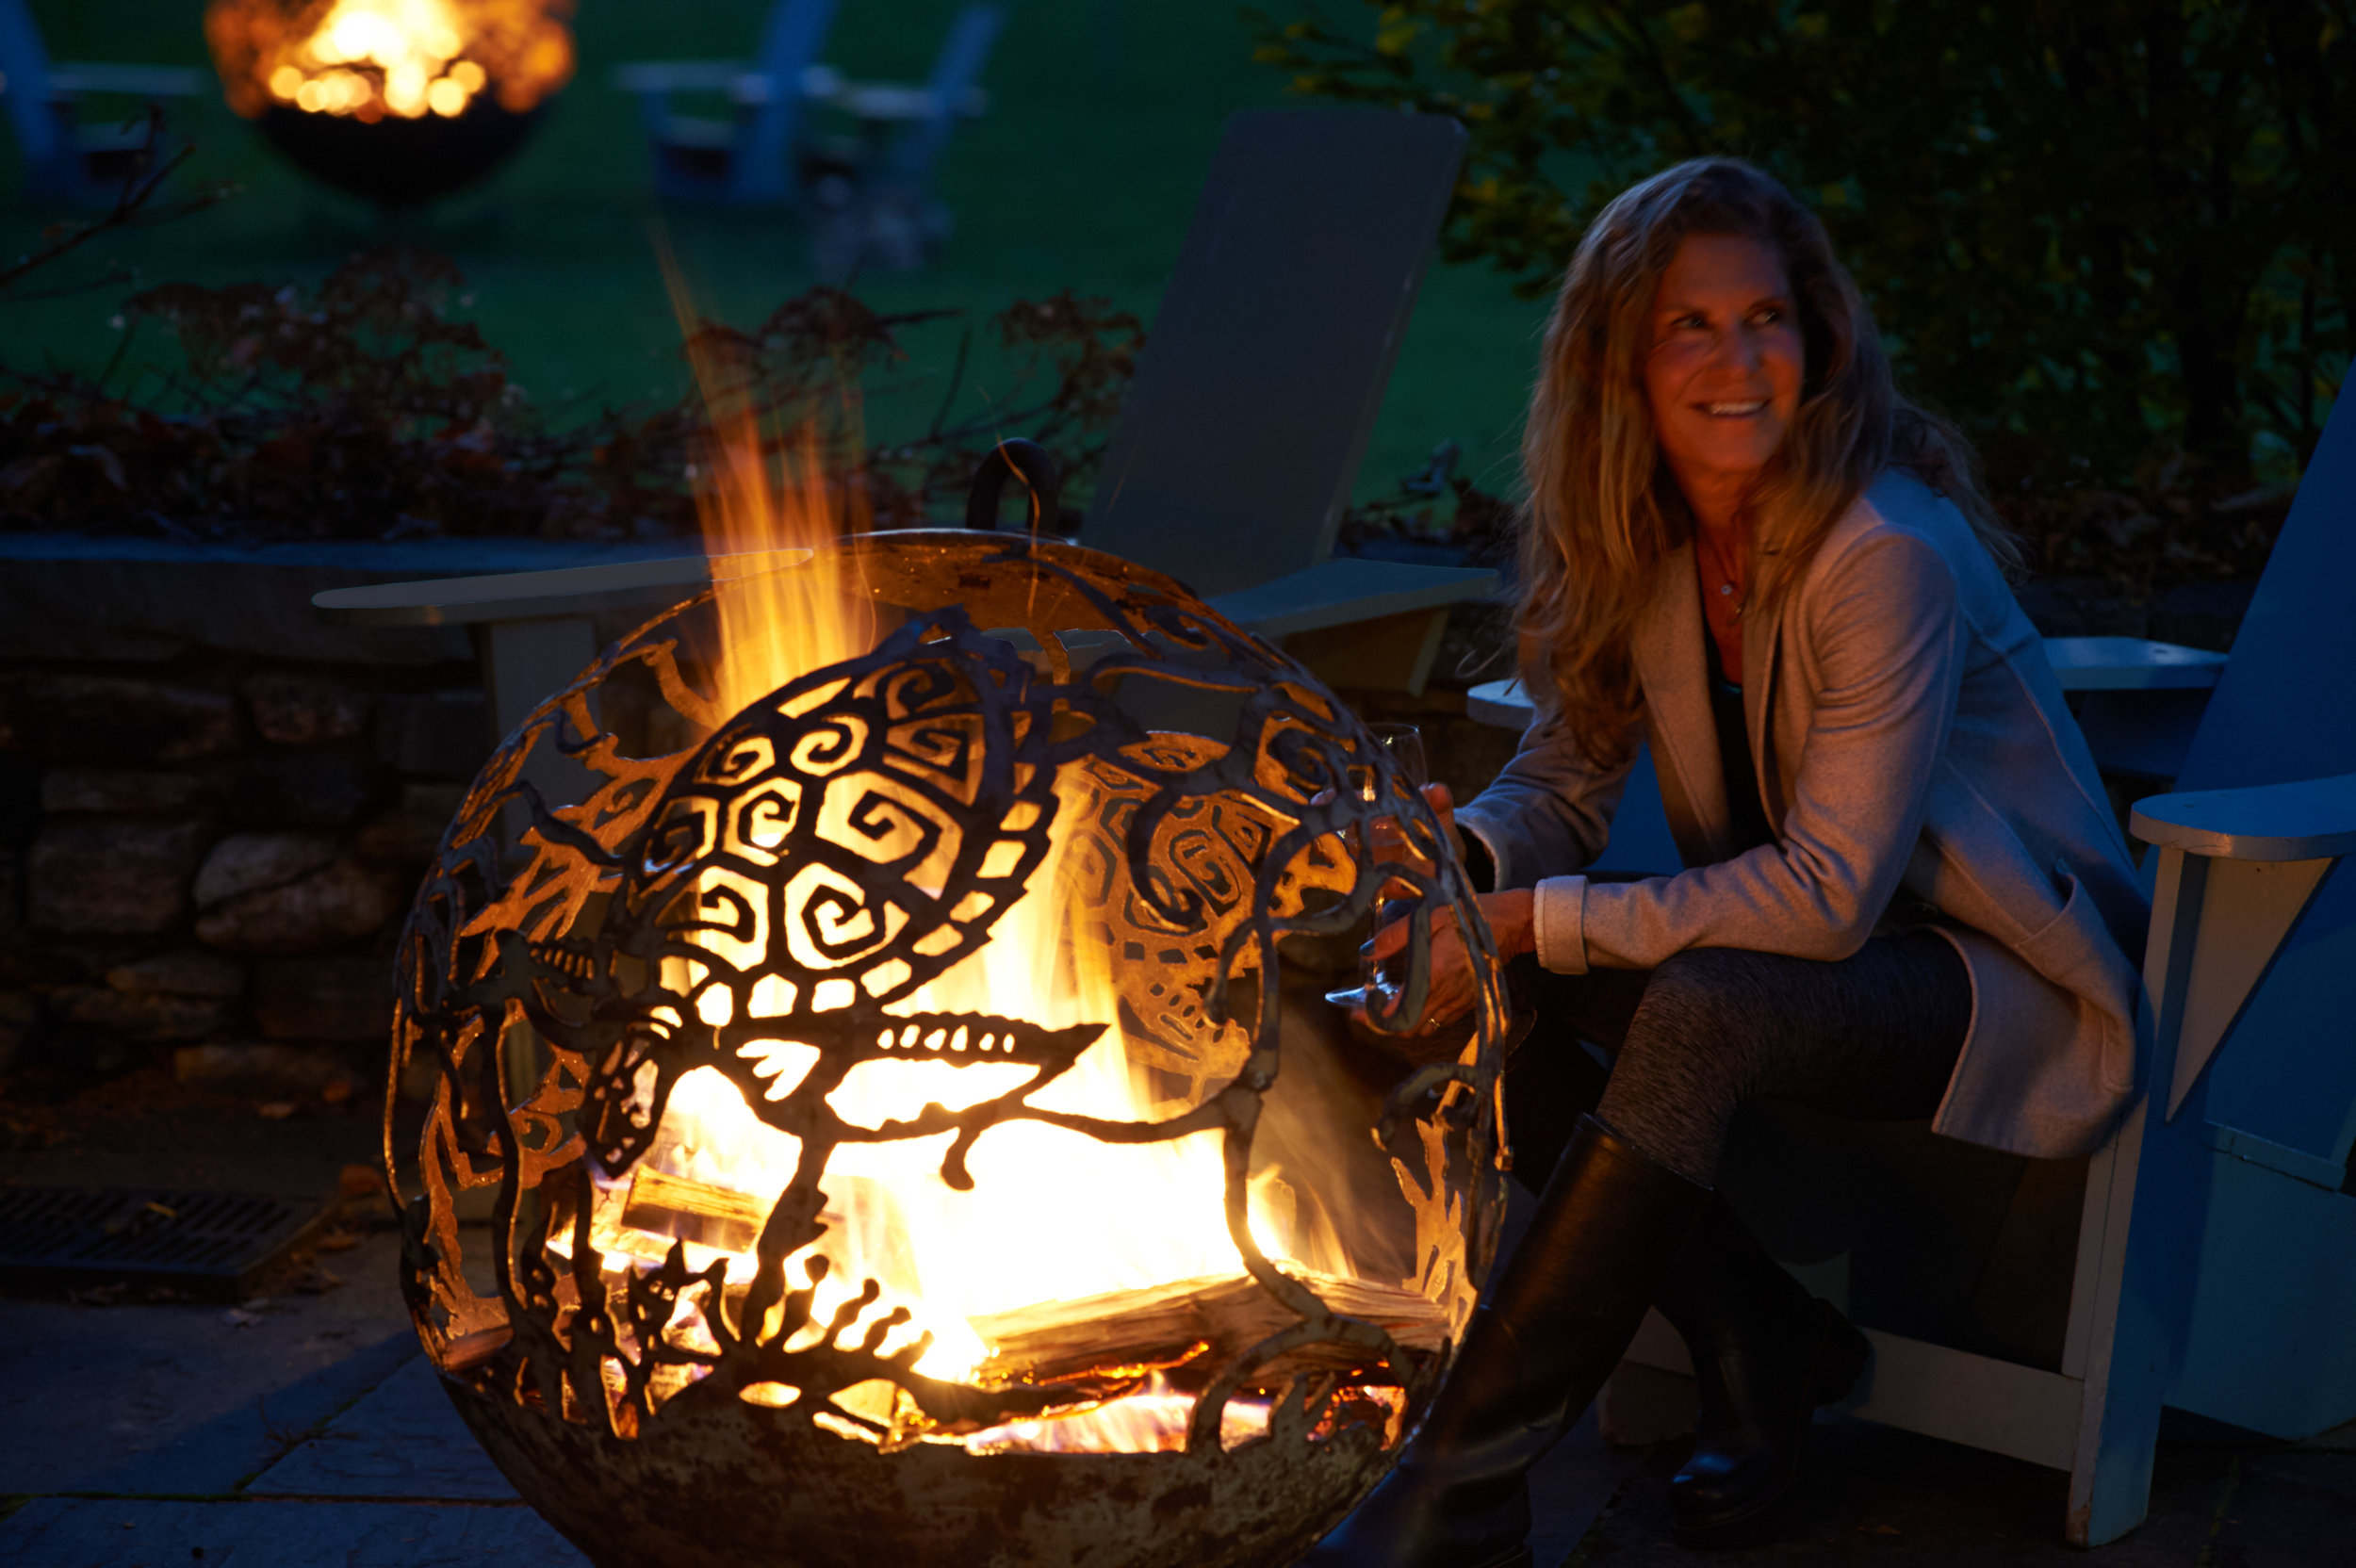 Mooring Fireballs by Sandra VlockPhotography @EdwinaStevenson 2015